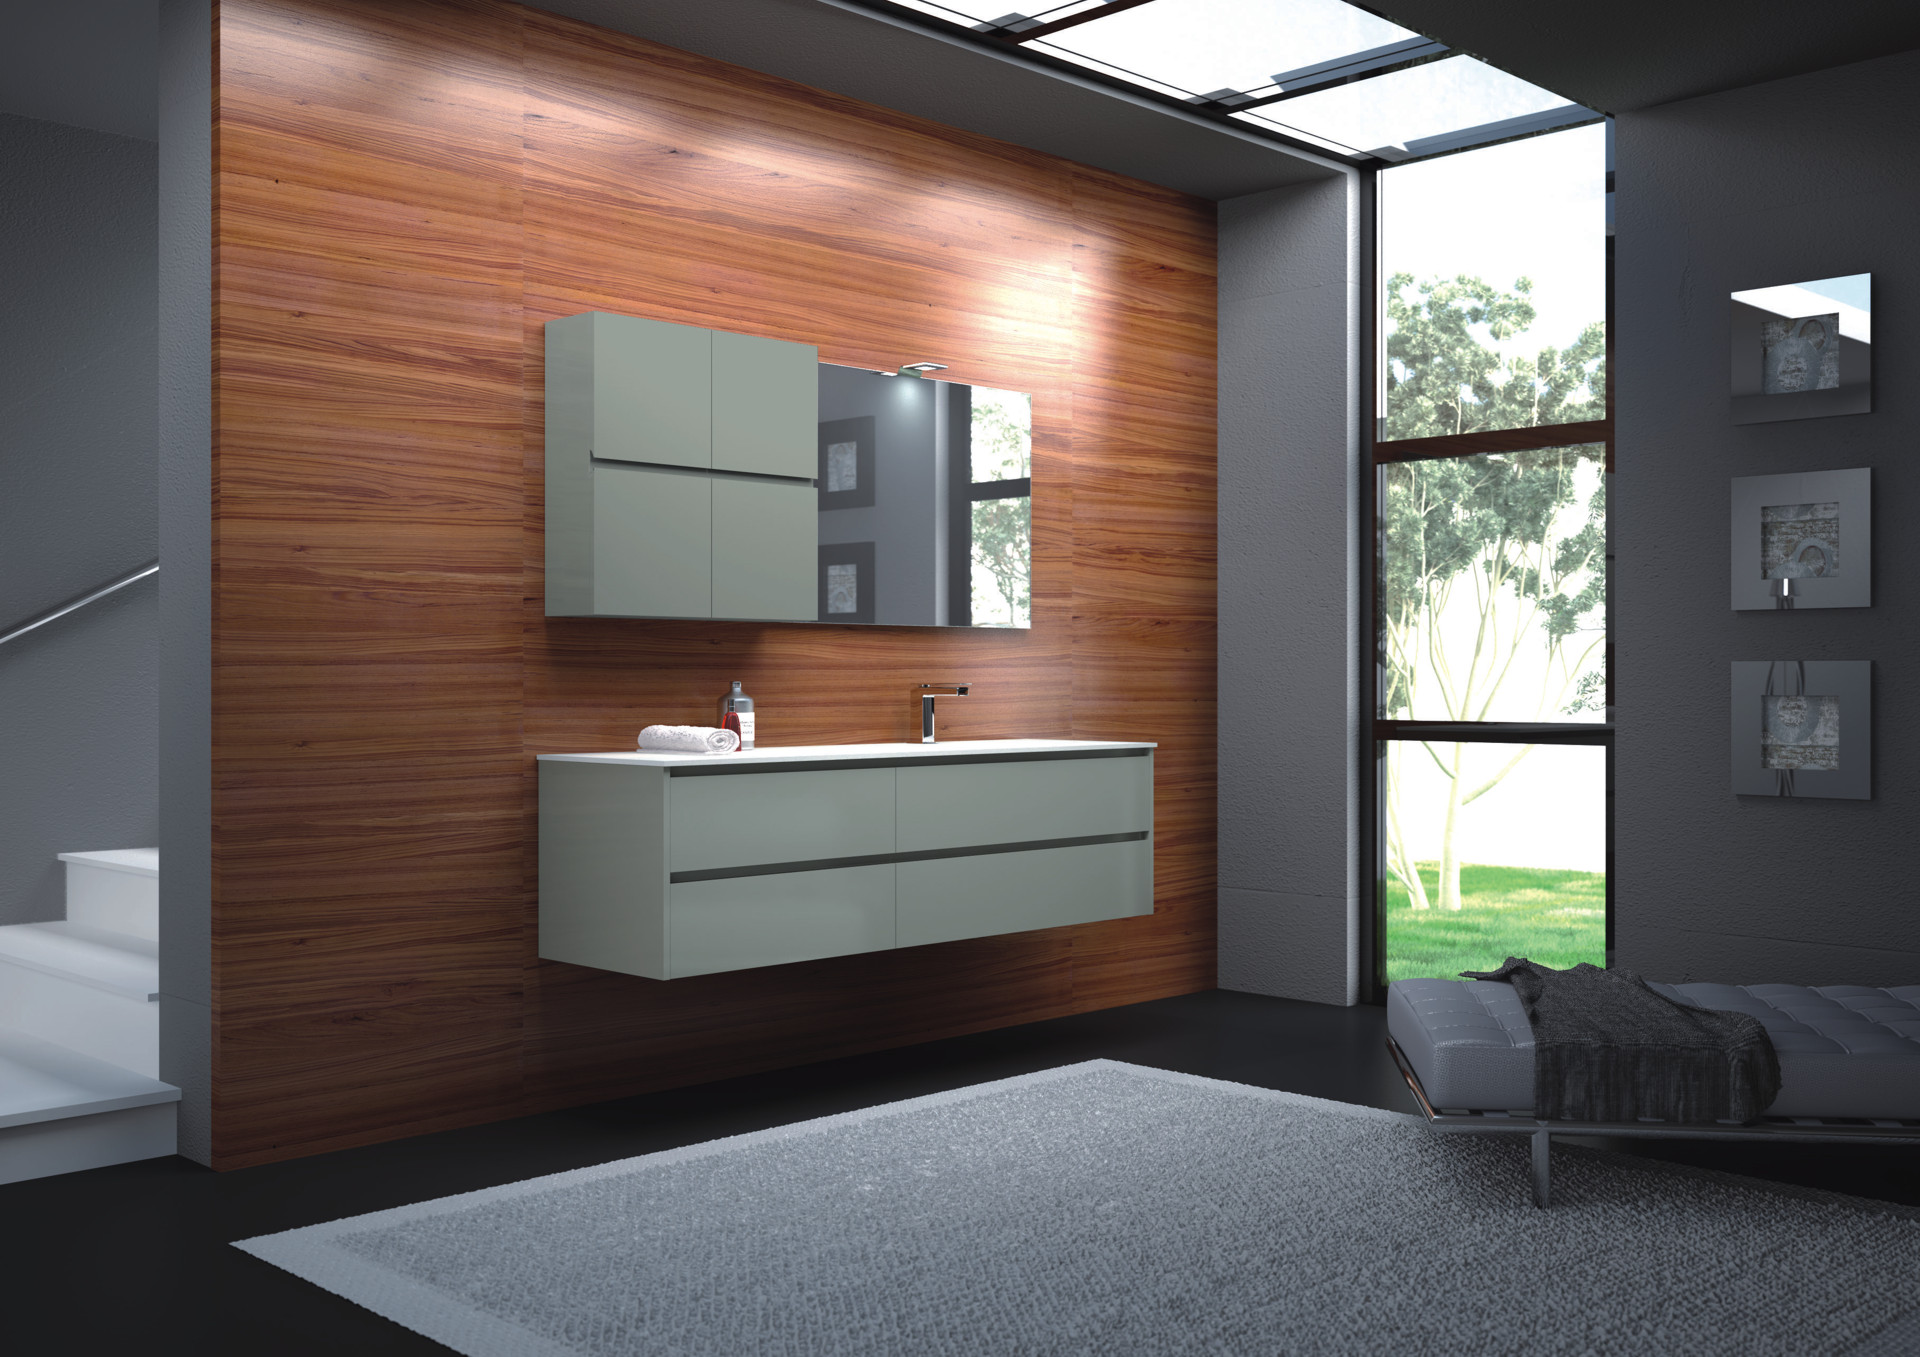 Arredo Bagno Cesano Maderno ~ Design casa creativa e mobili ispiratori